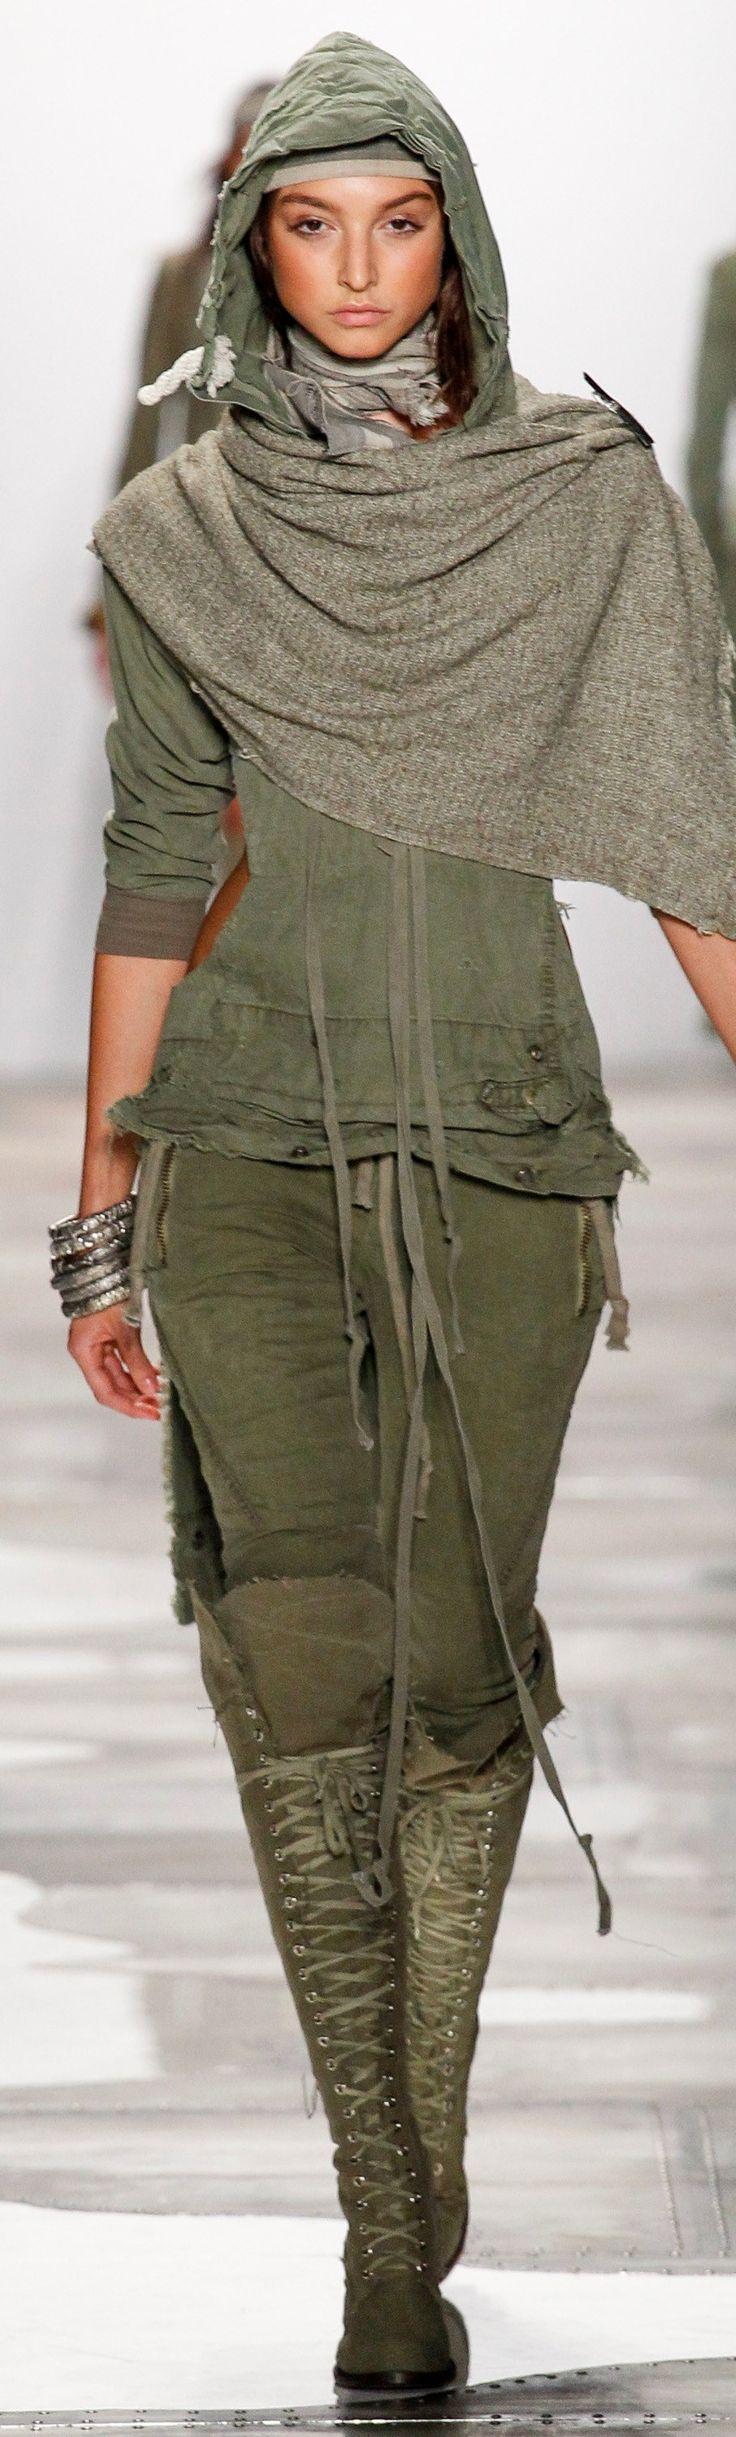 Greg Lauren Spring 2016 Ready-to-Wear                                                                                                                                                      More